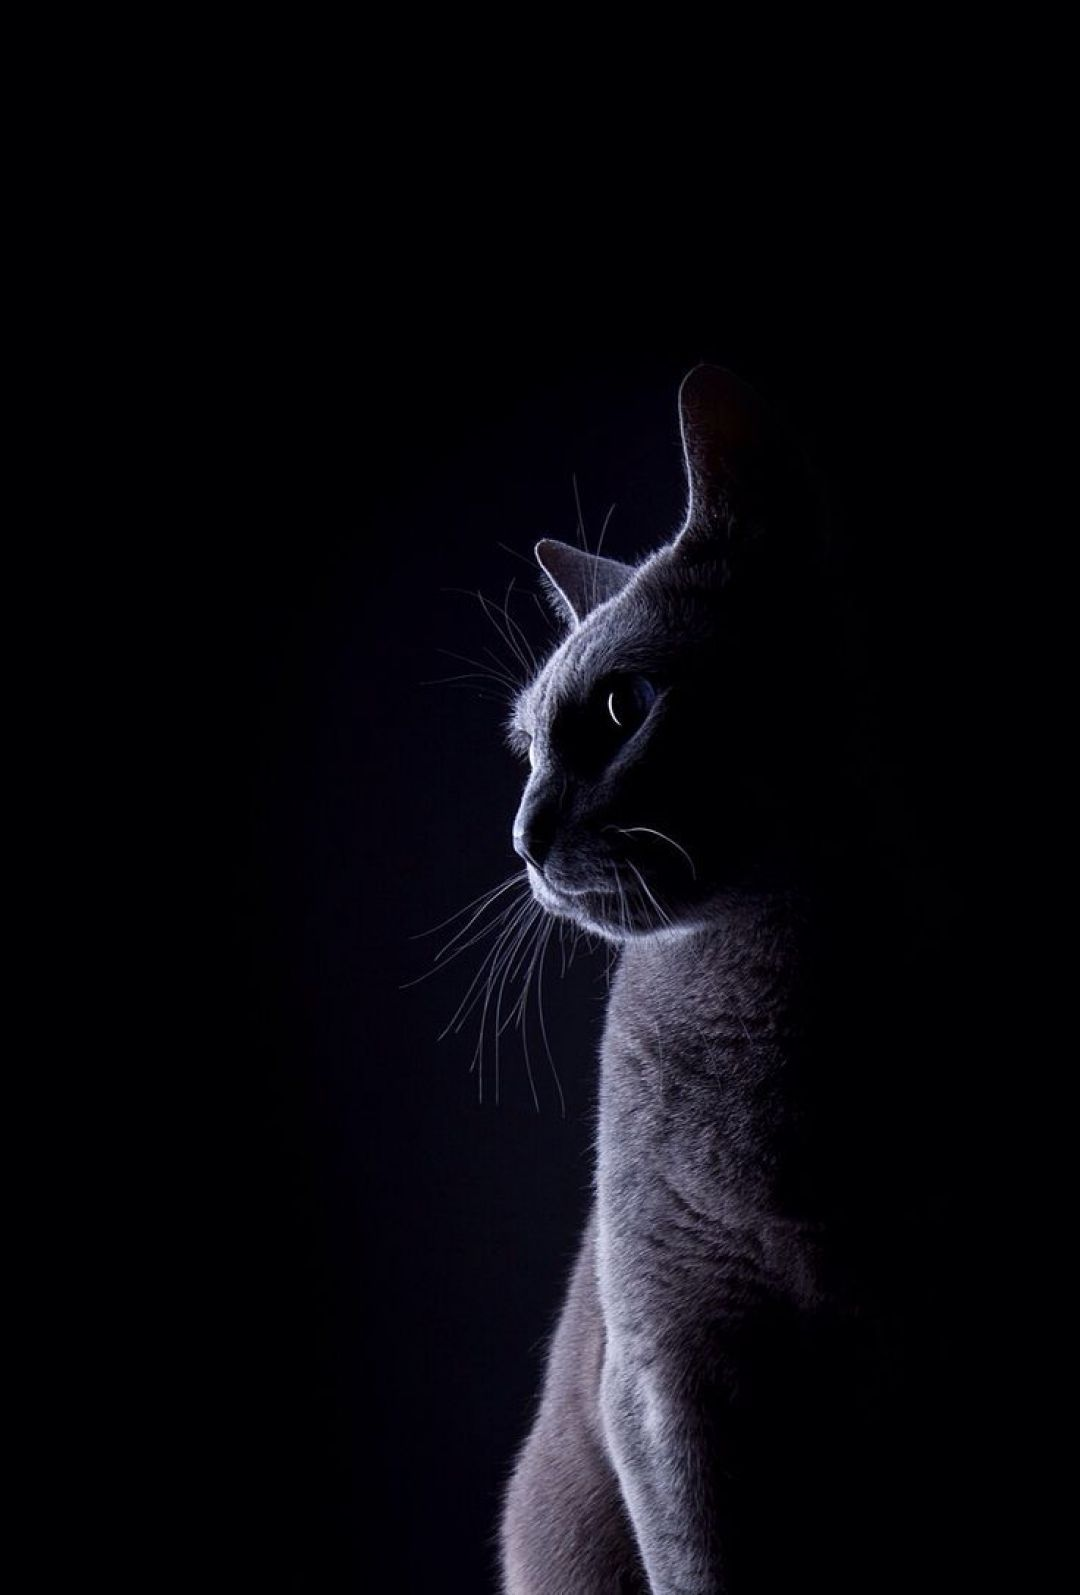 Cat Phone Android Iphone Desktop Hd Backgrounds Wallpapers 1080p 4k 101441 Hdwallpapers Androidwallpapers Iphon Animals Cats Cat Phone Wallpaper